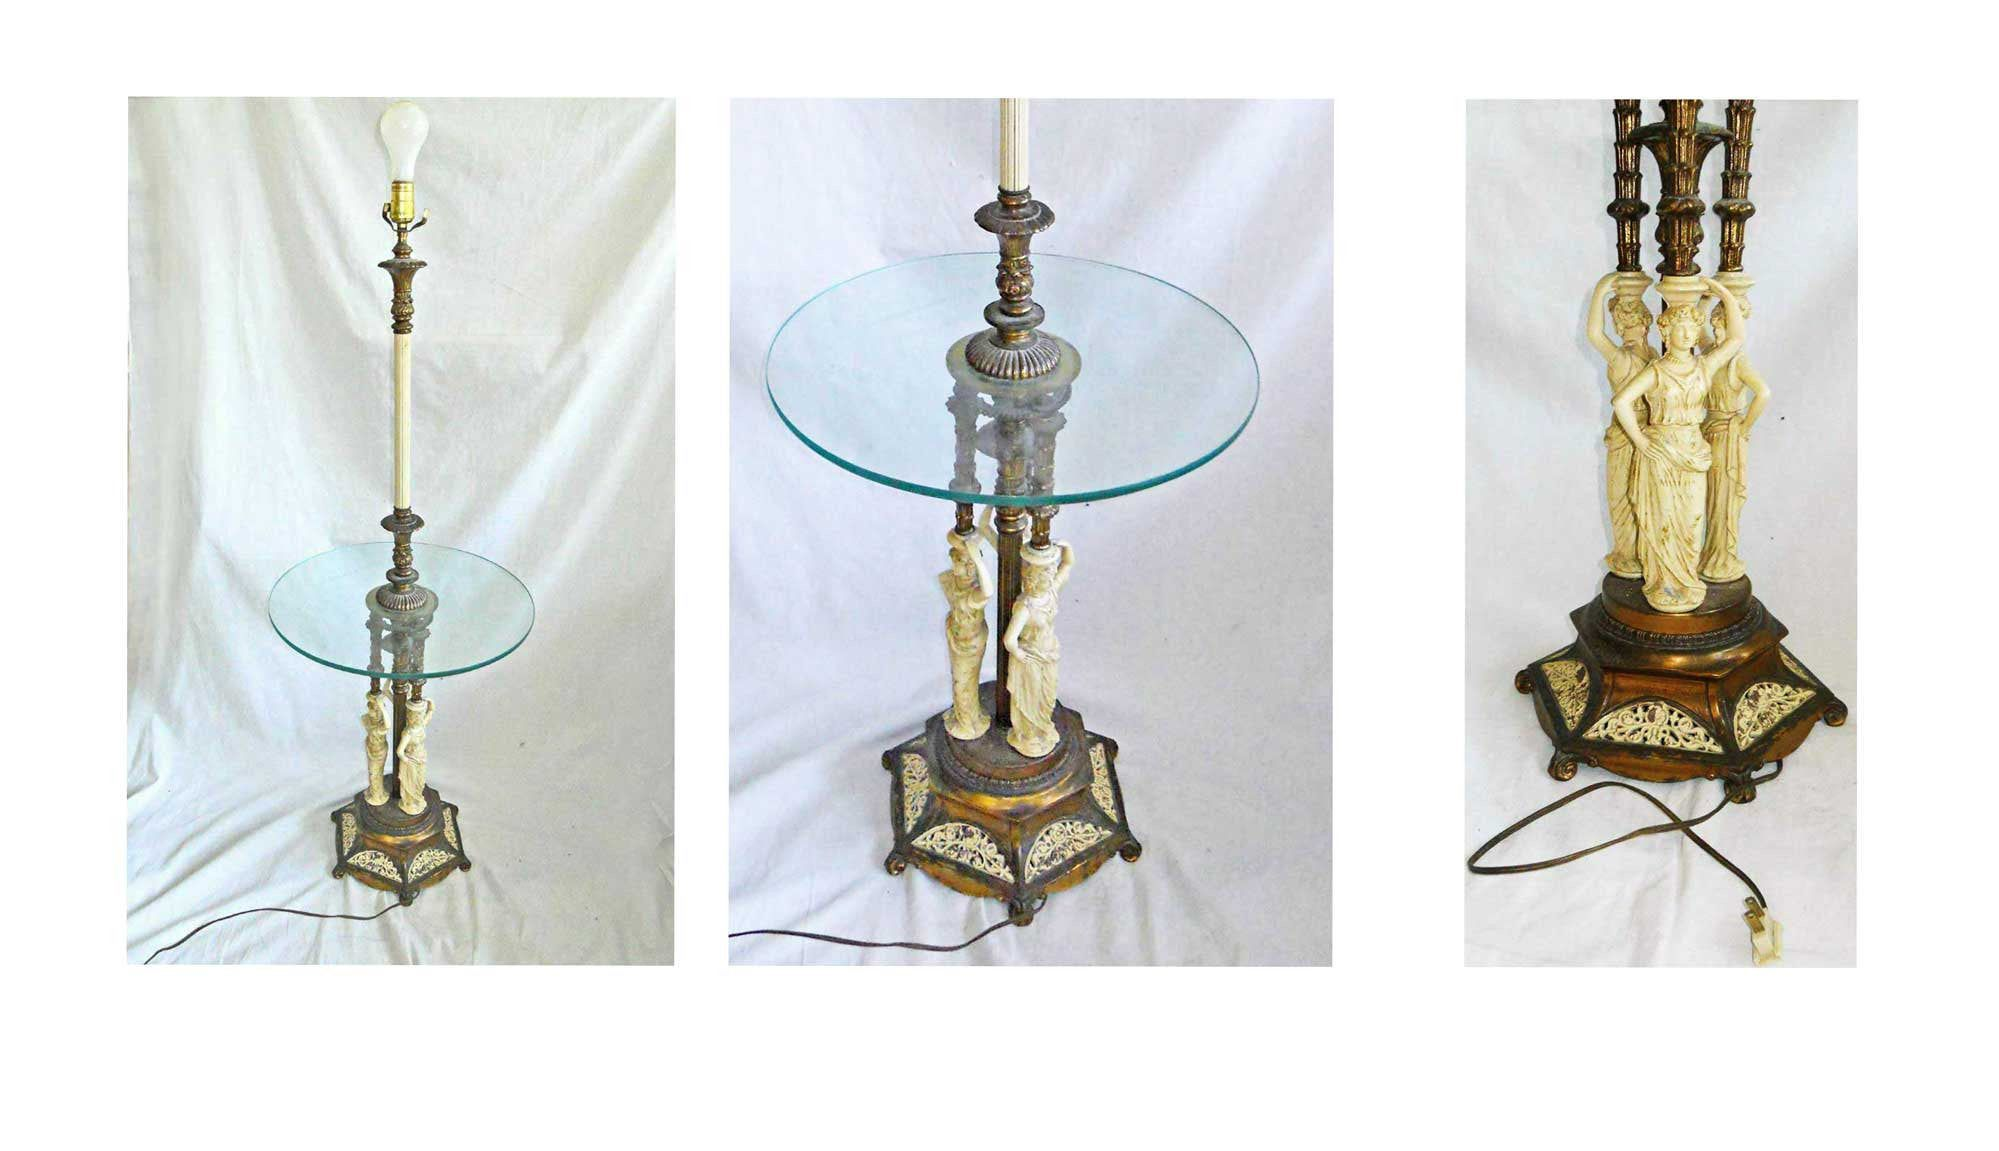 Floor Lamp Table Figural Sculpture Hollywood Regency Baroque Brass